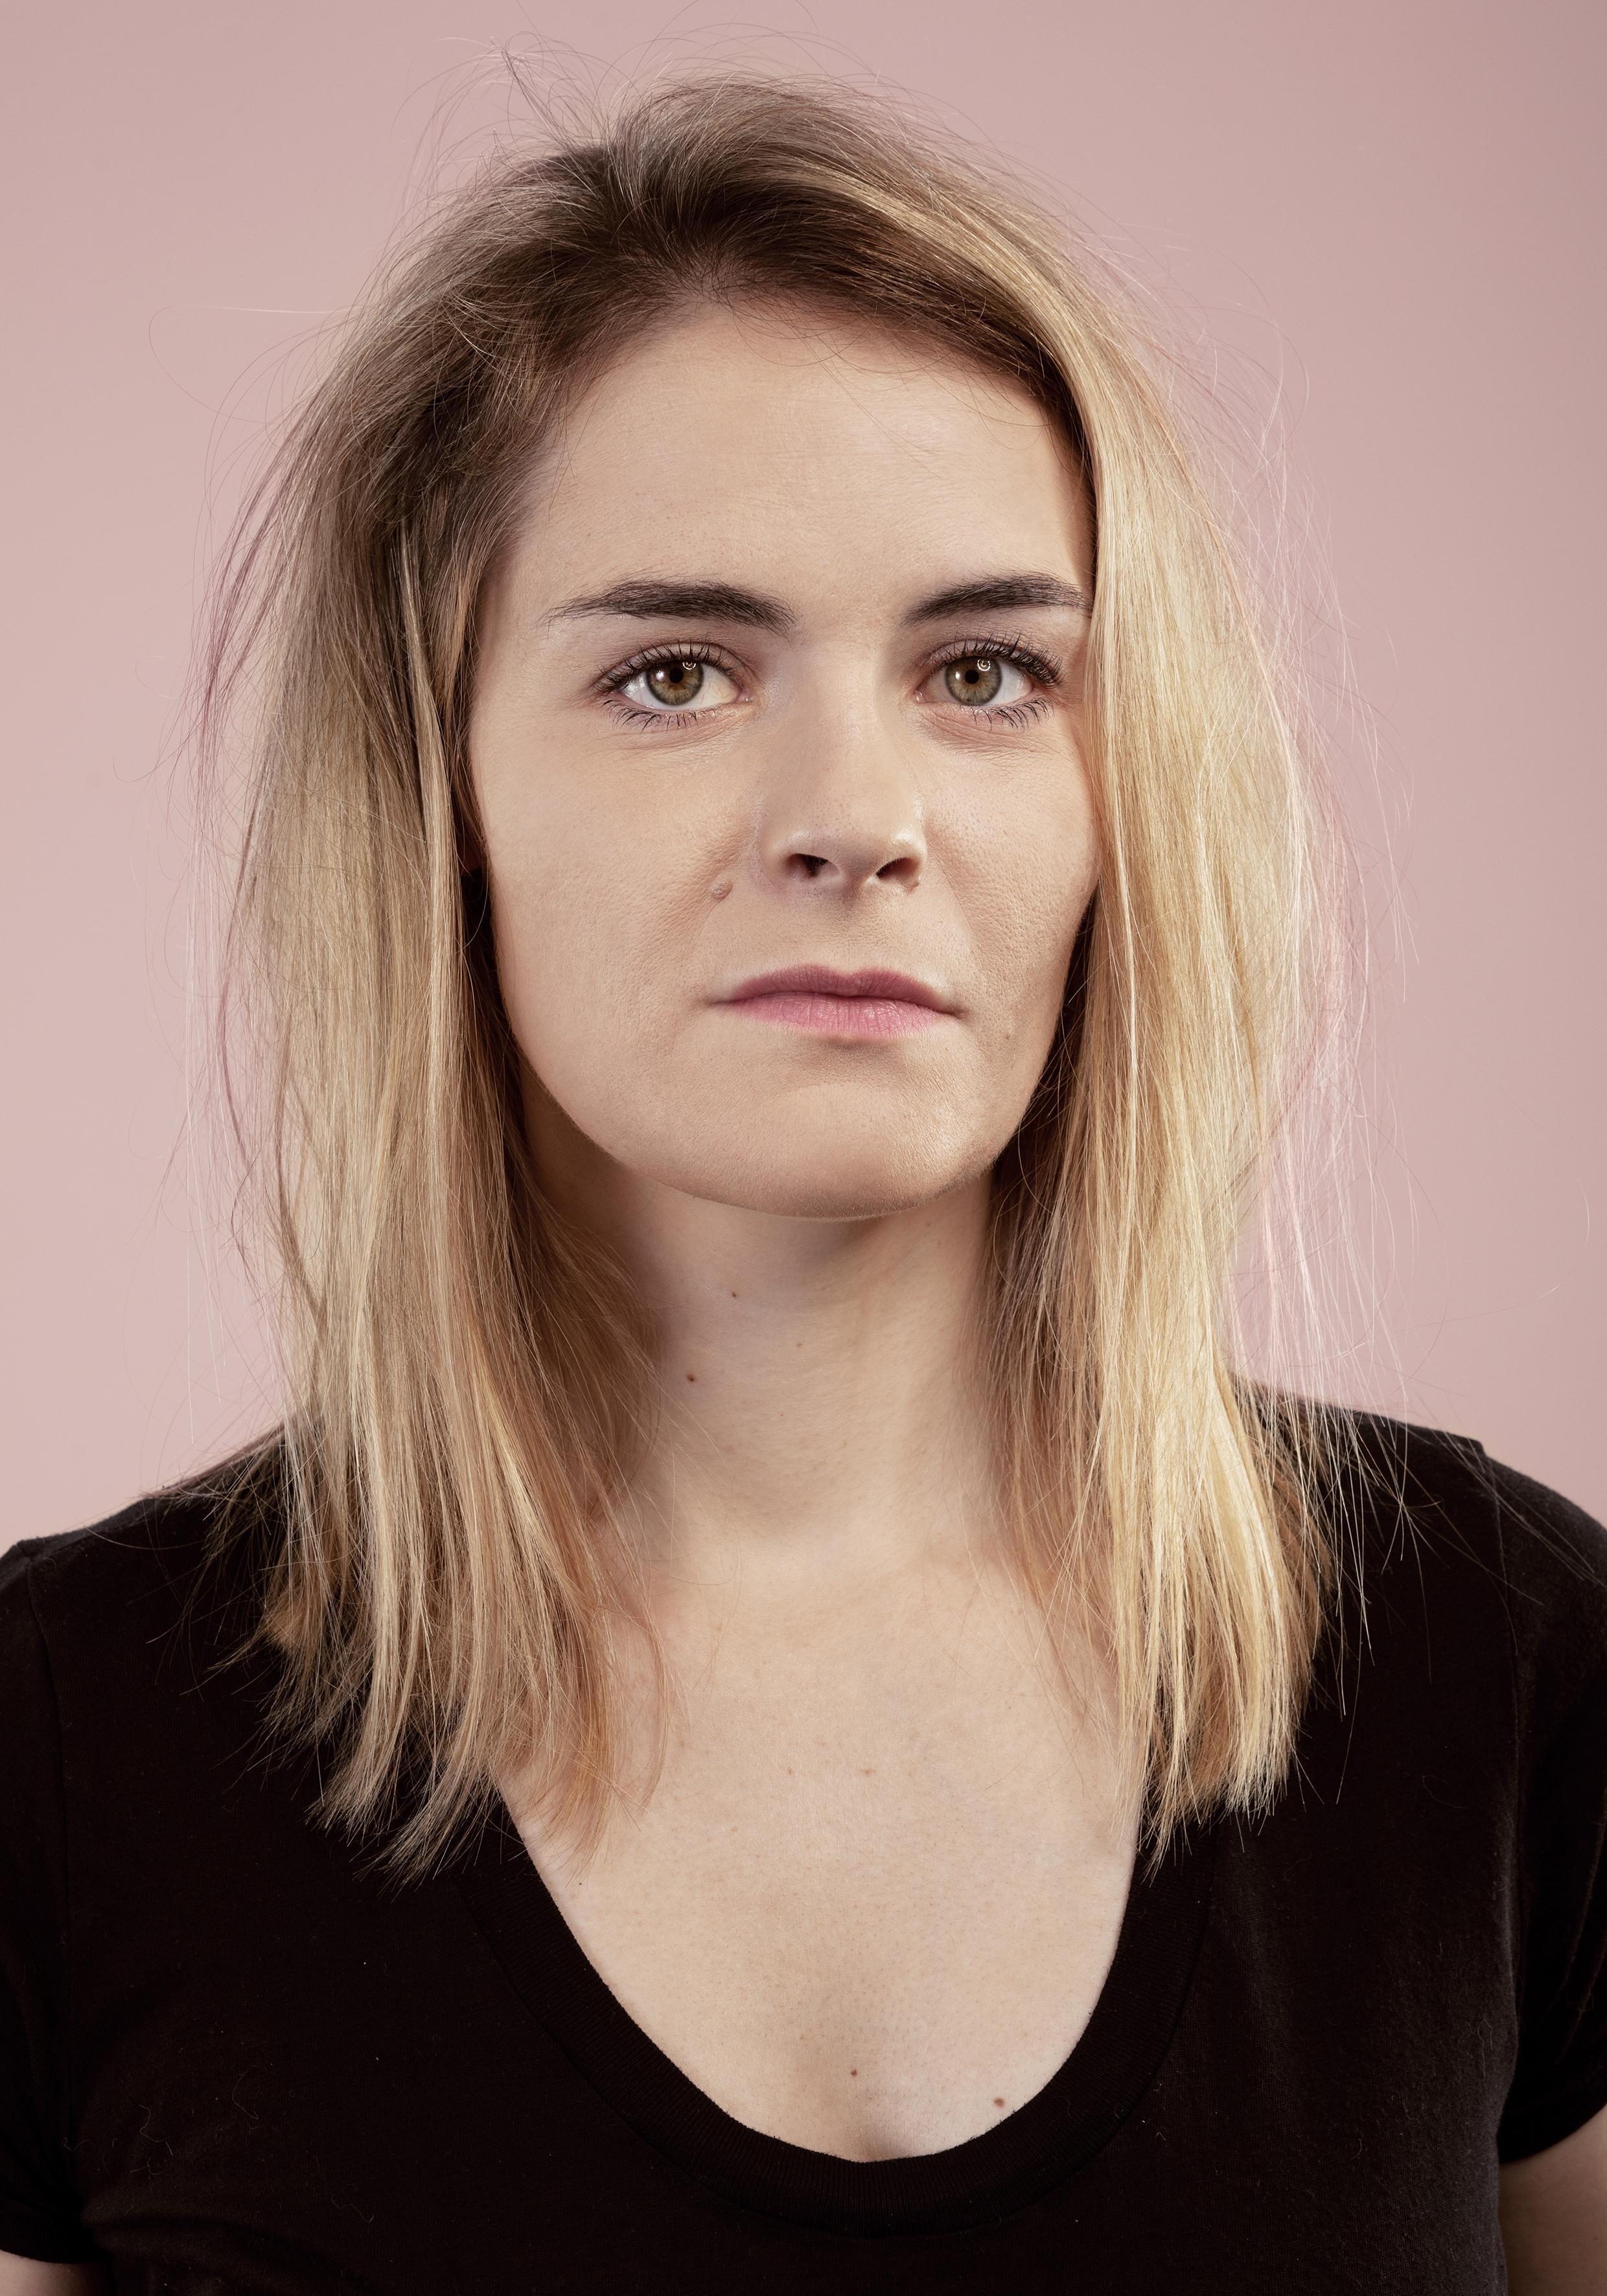 Hazel Brugger - Kennen Sie diese Frau?